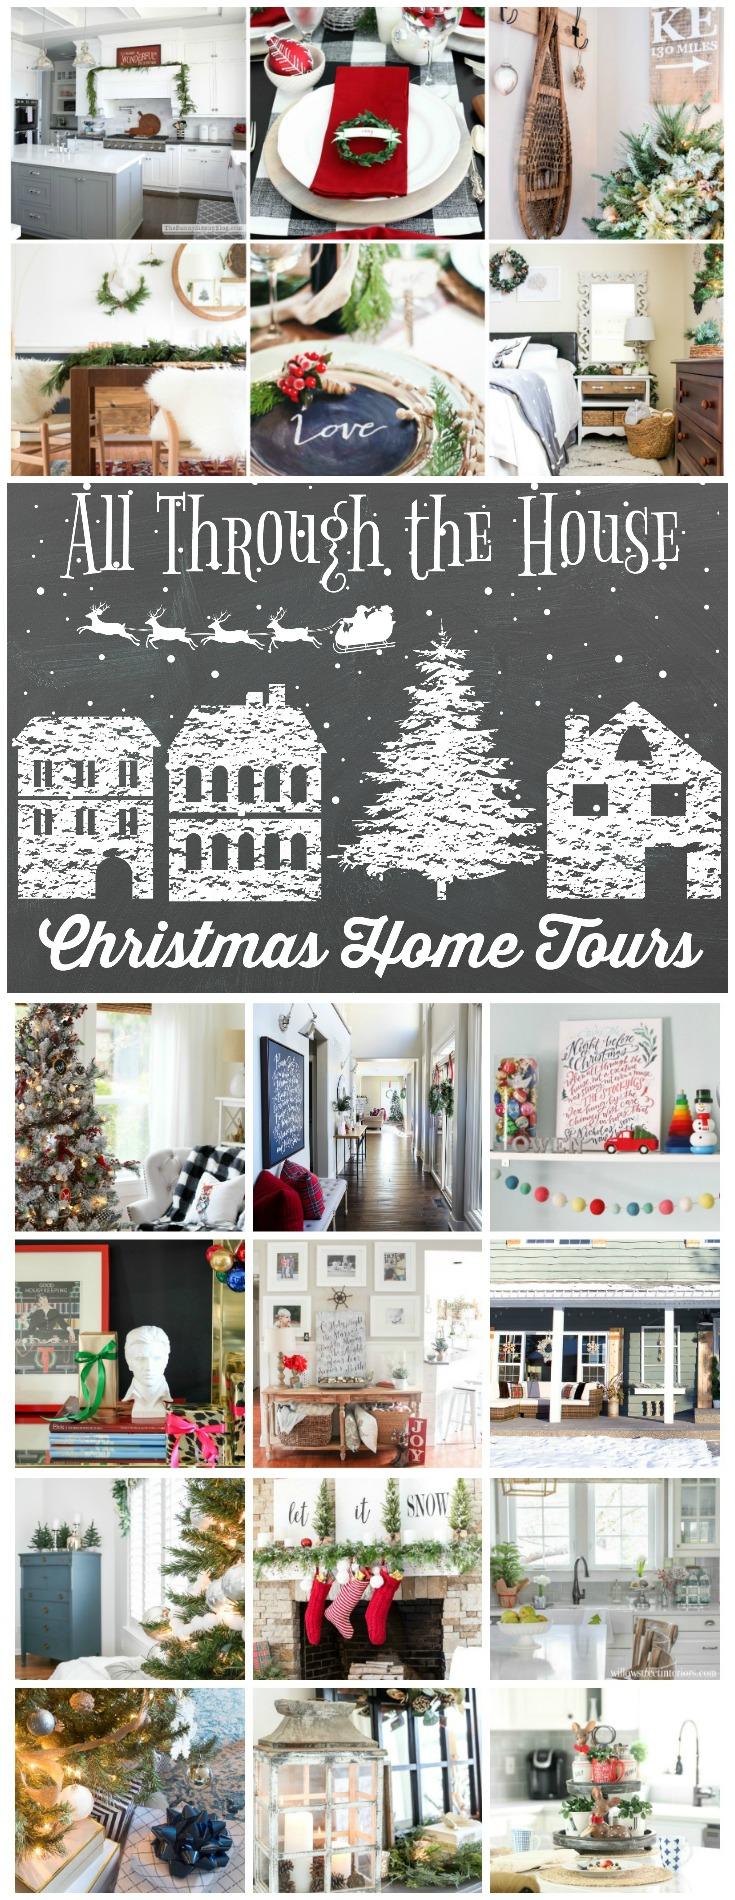 All Through the House Christmas Tours